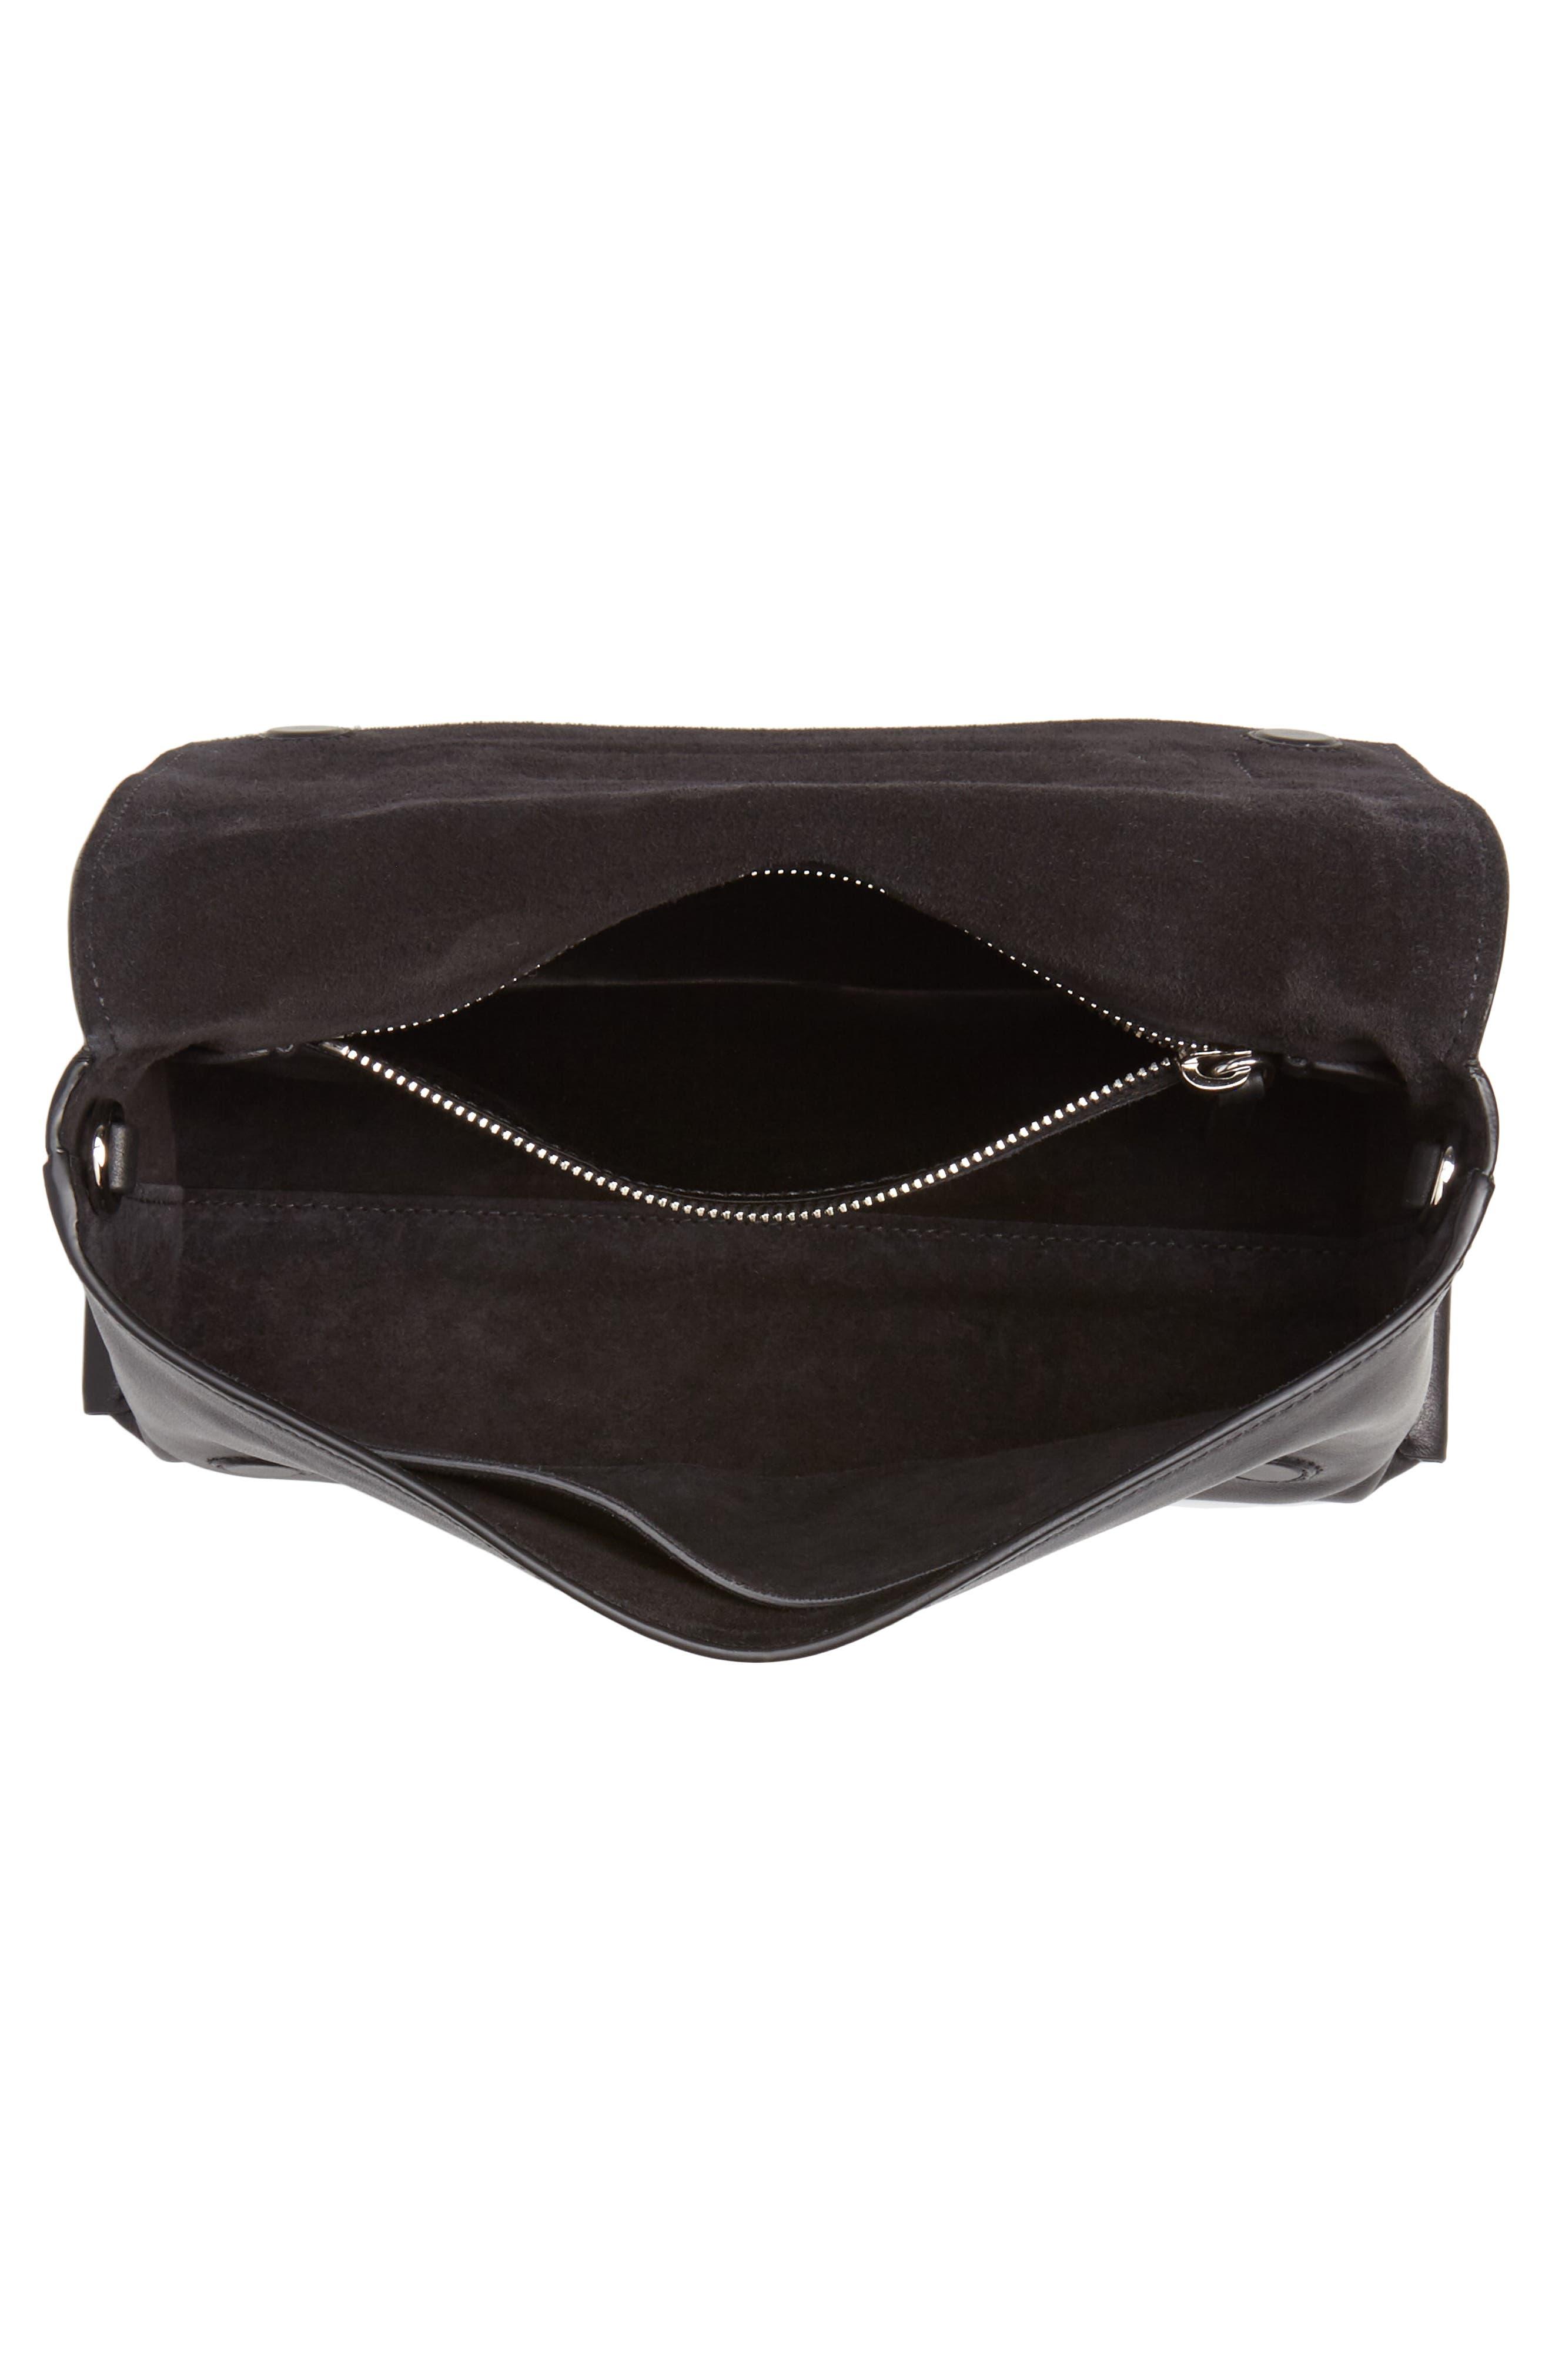 Small Grace Calfskin Shoulder Bag,                             Alternate thumbnail 4, color,                             NERO/ BIANCO